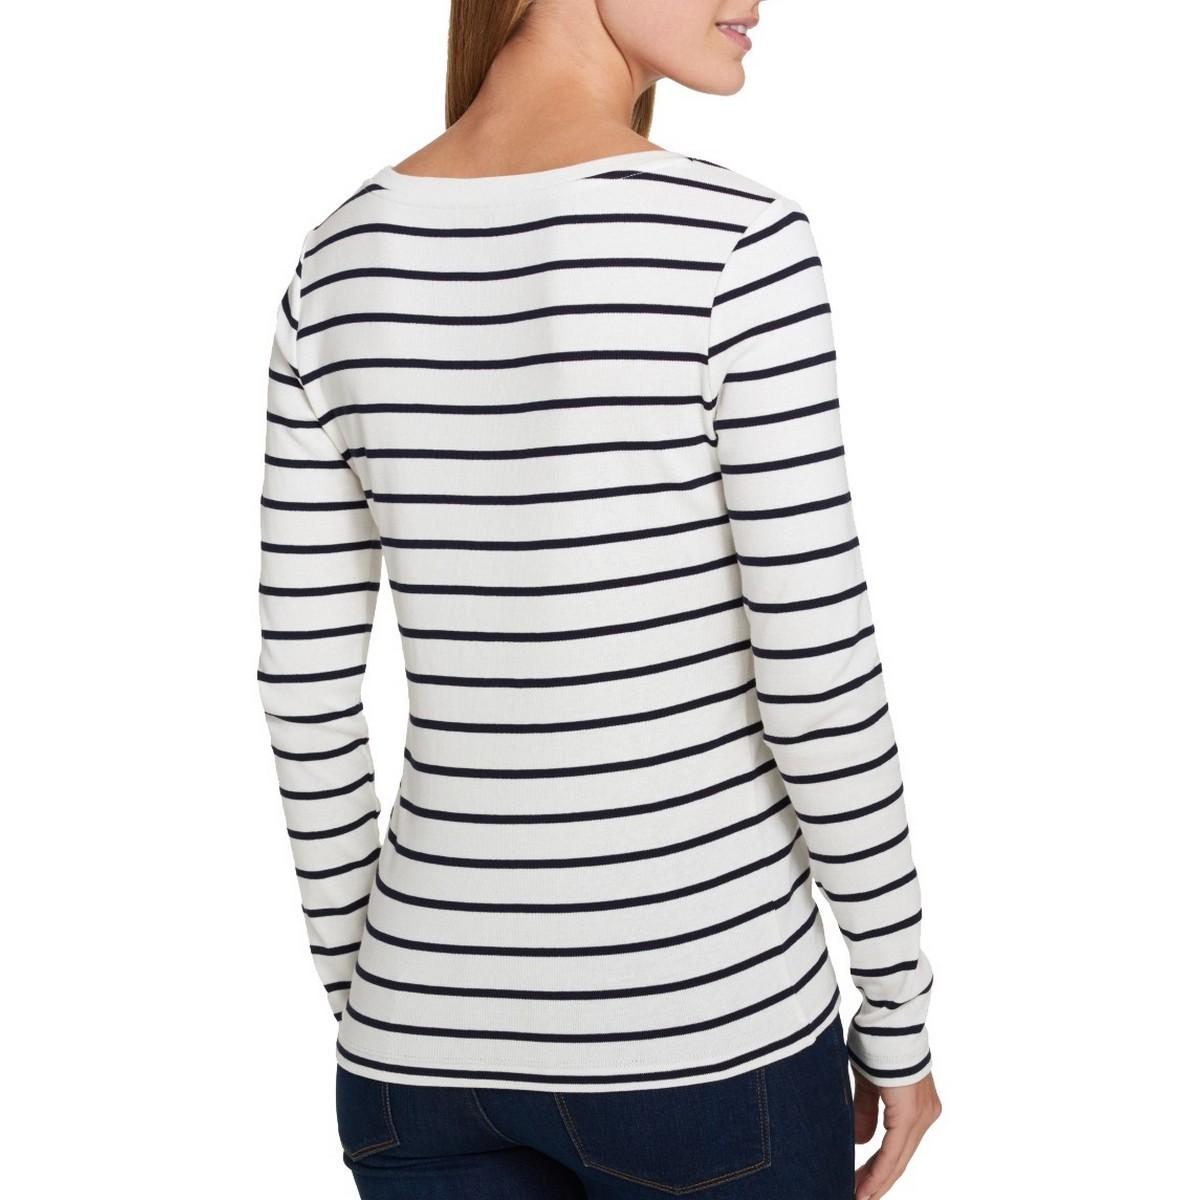 TOMMY-HILFIGER-NEW-Women-039-s-Cotton-Striped-Scoop-Neck-T-shirt-Top-TEDO thumbnail 3